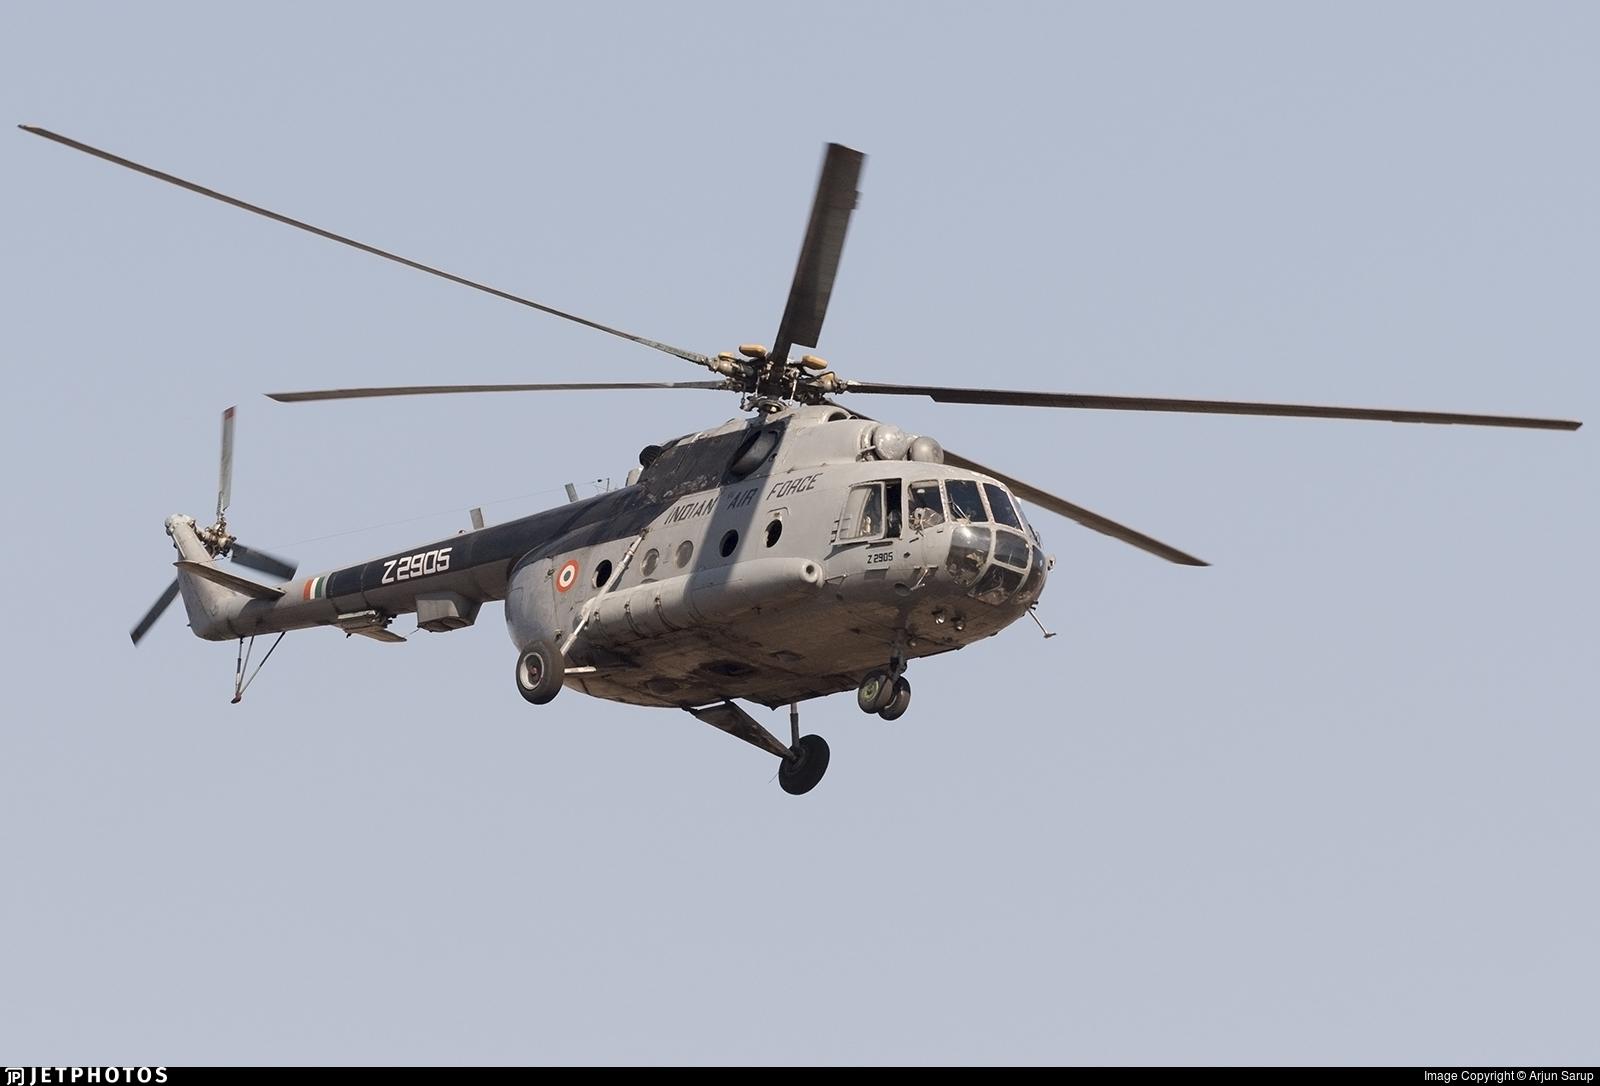 Z2905 - Mil Mi-17-1V Hip - India - Air Force